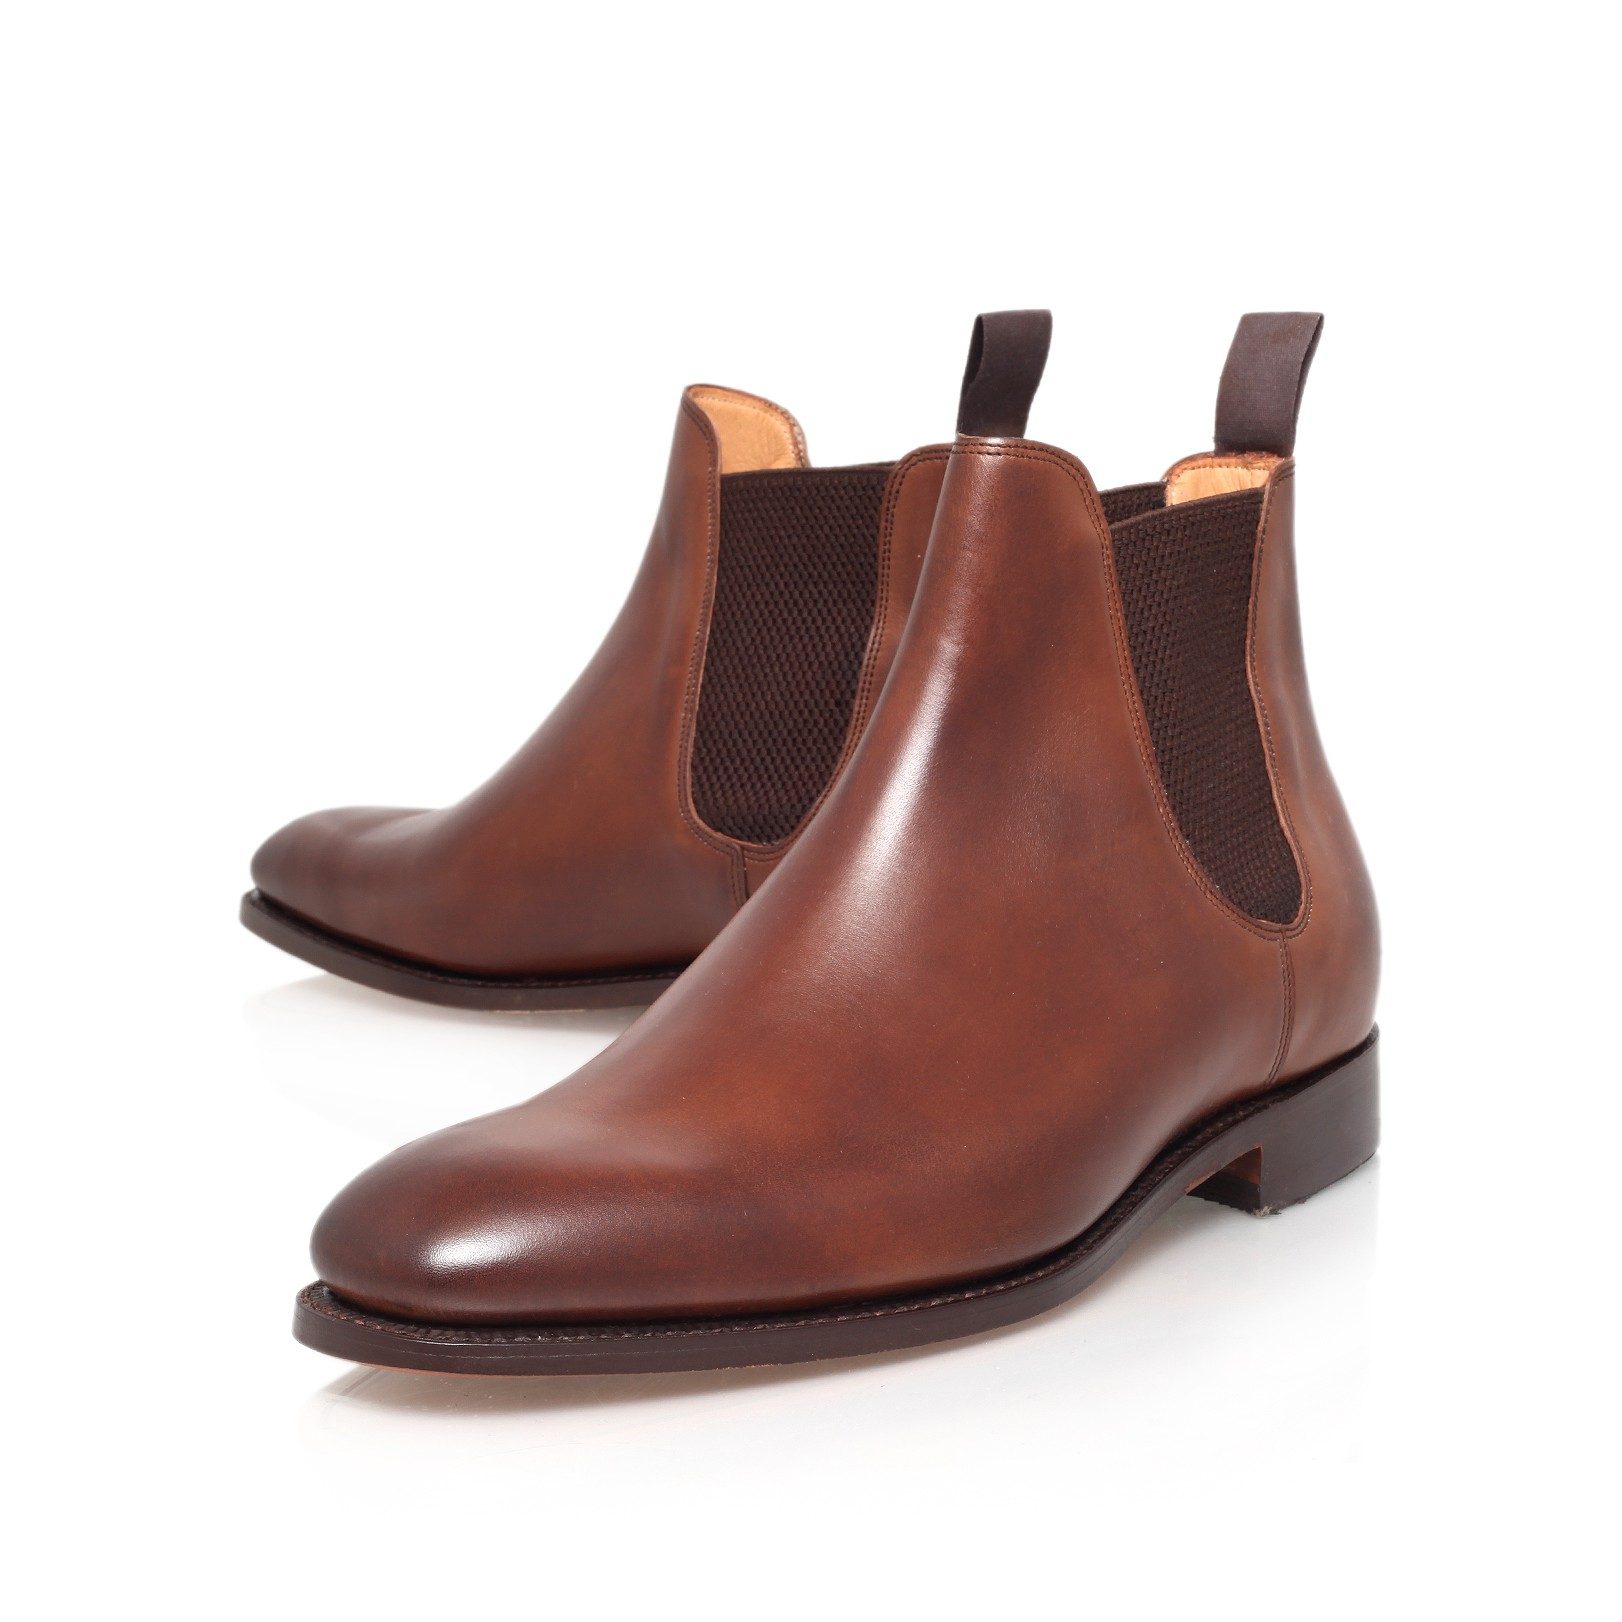 f58e99183a4 Barker Eskdale Chelsea Boot in Brown for Men - Lyst